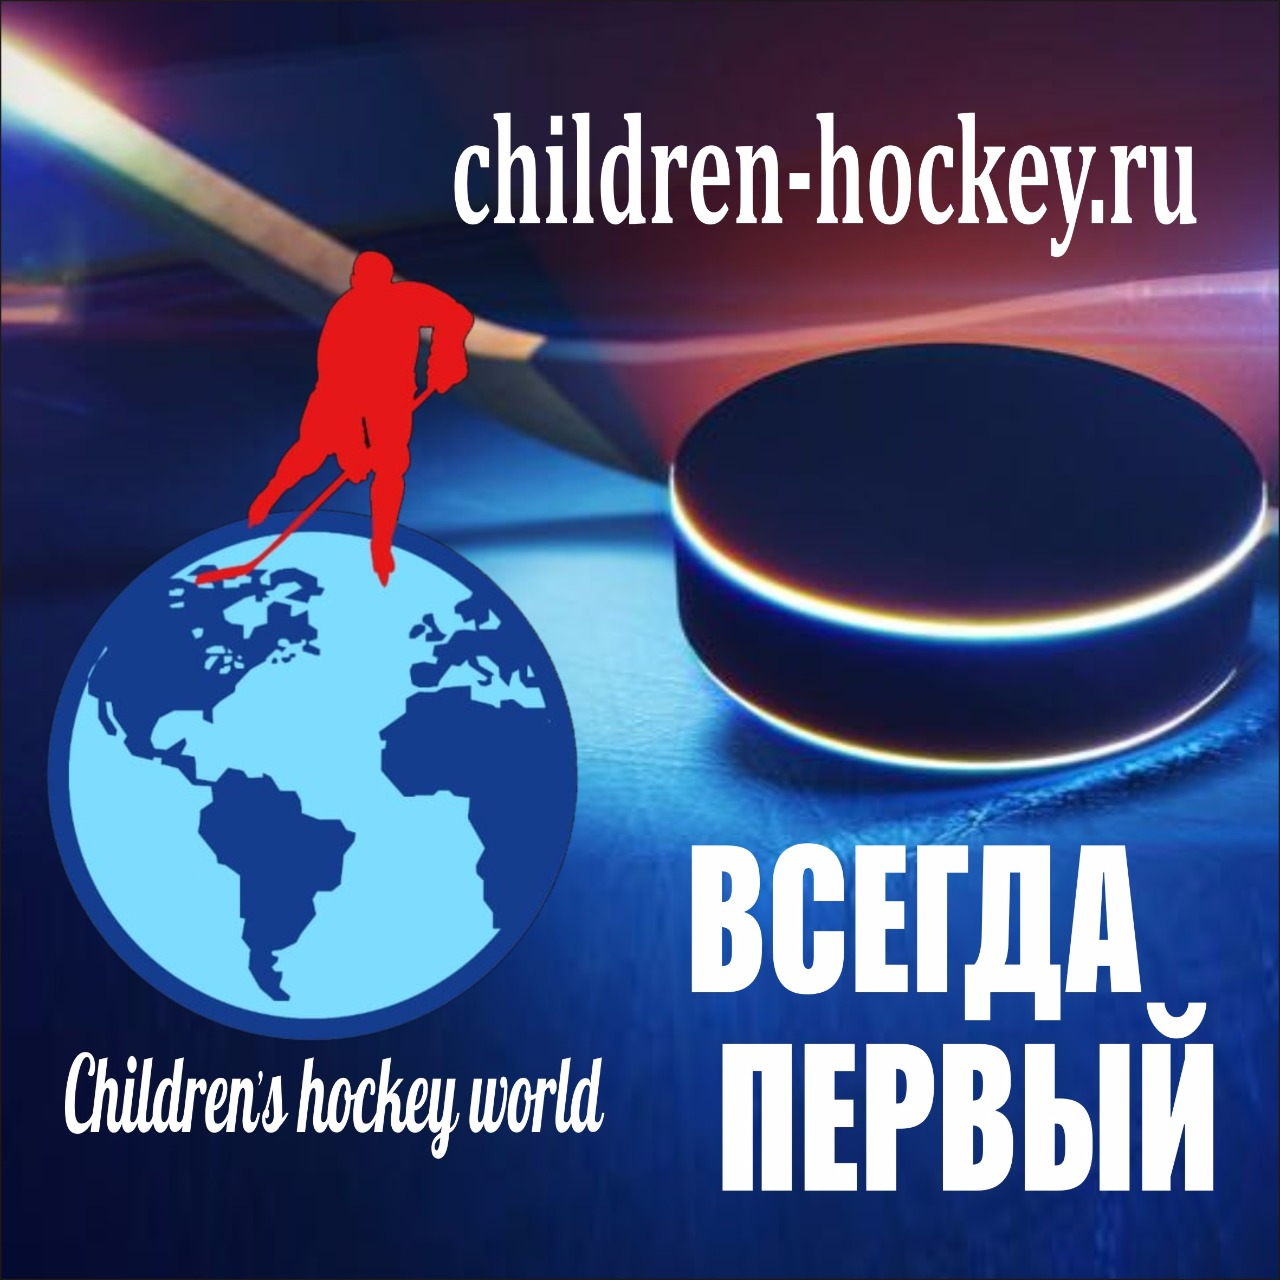 children-hockey